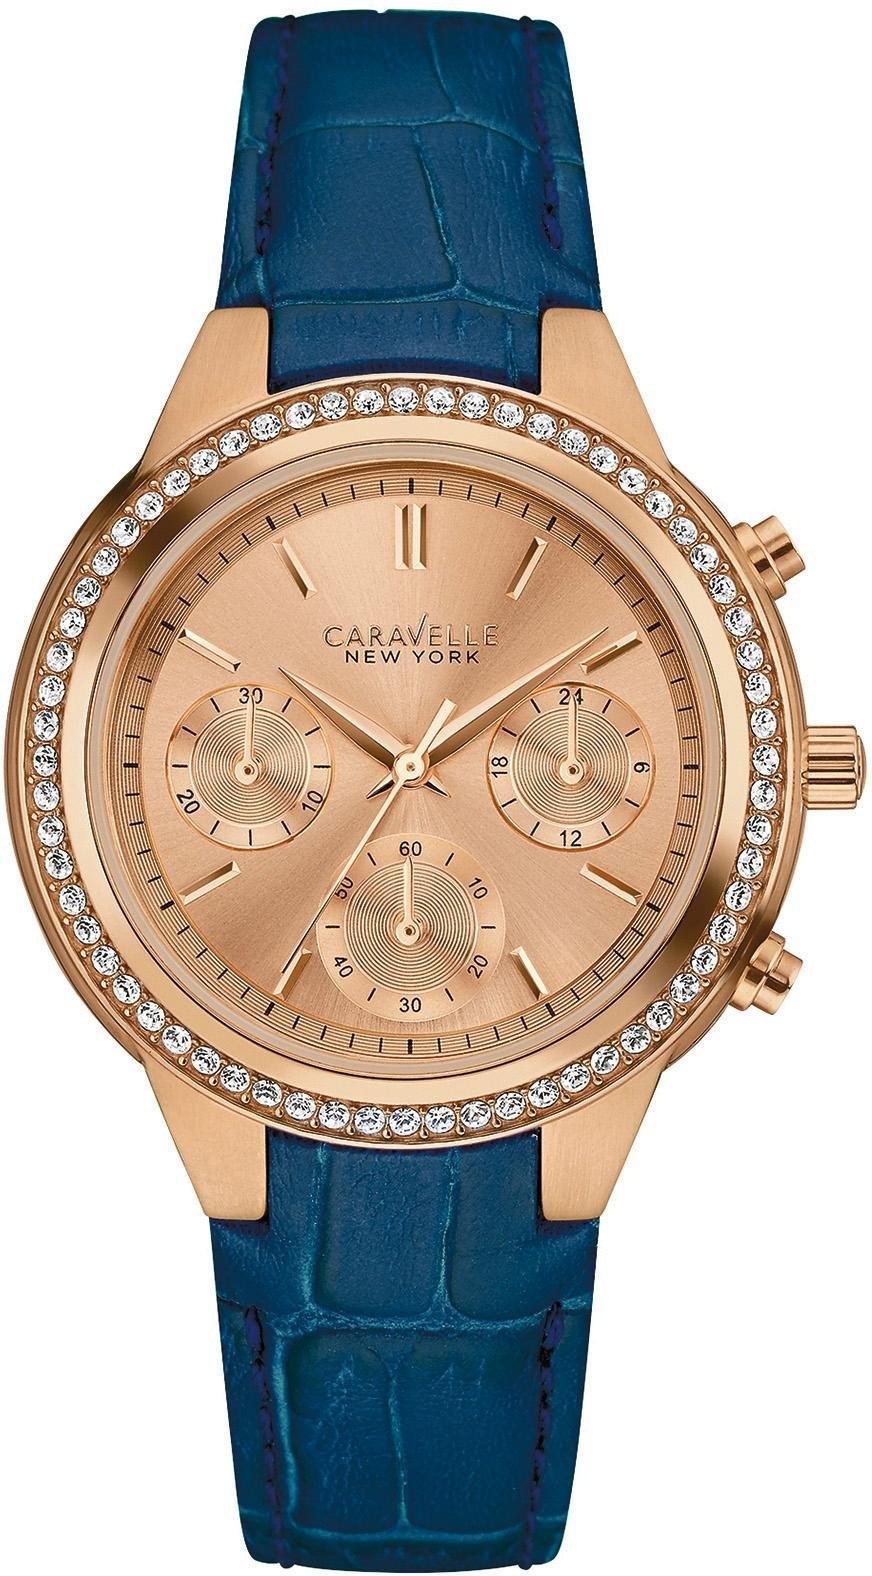 Caravelle New York chronograaf »44L183« online kopen op otto.nl